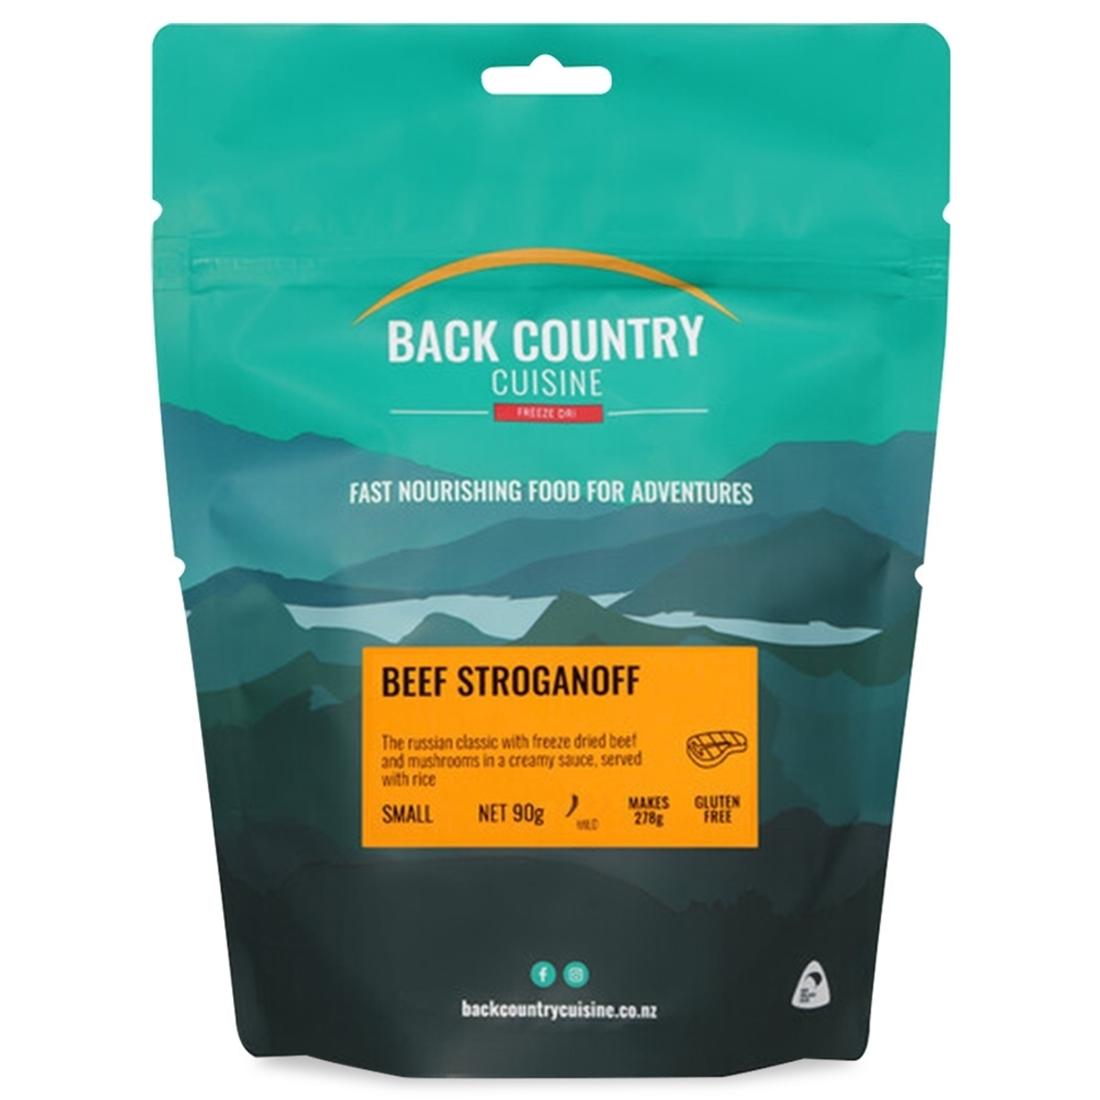 Back Country Cuisine Beef Stroganoff